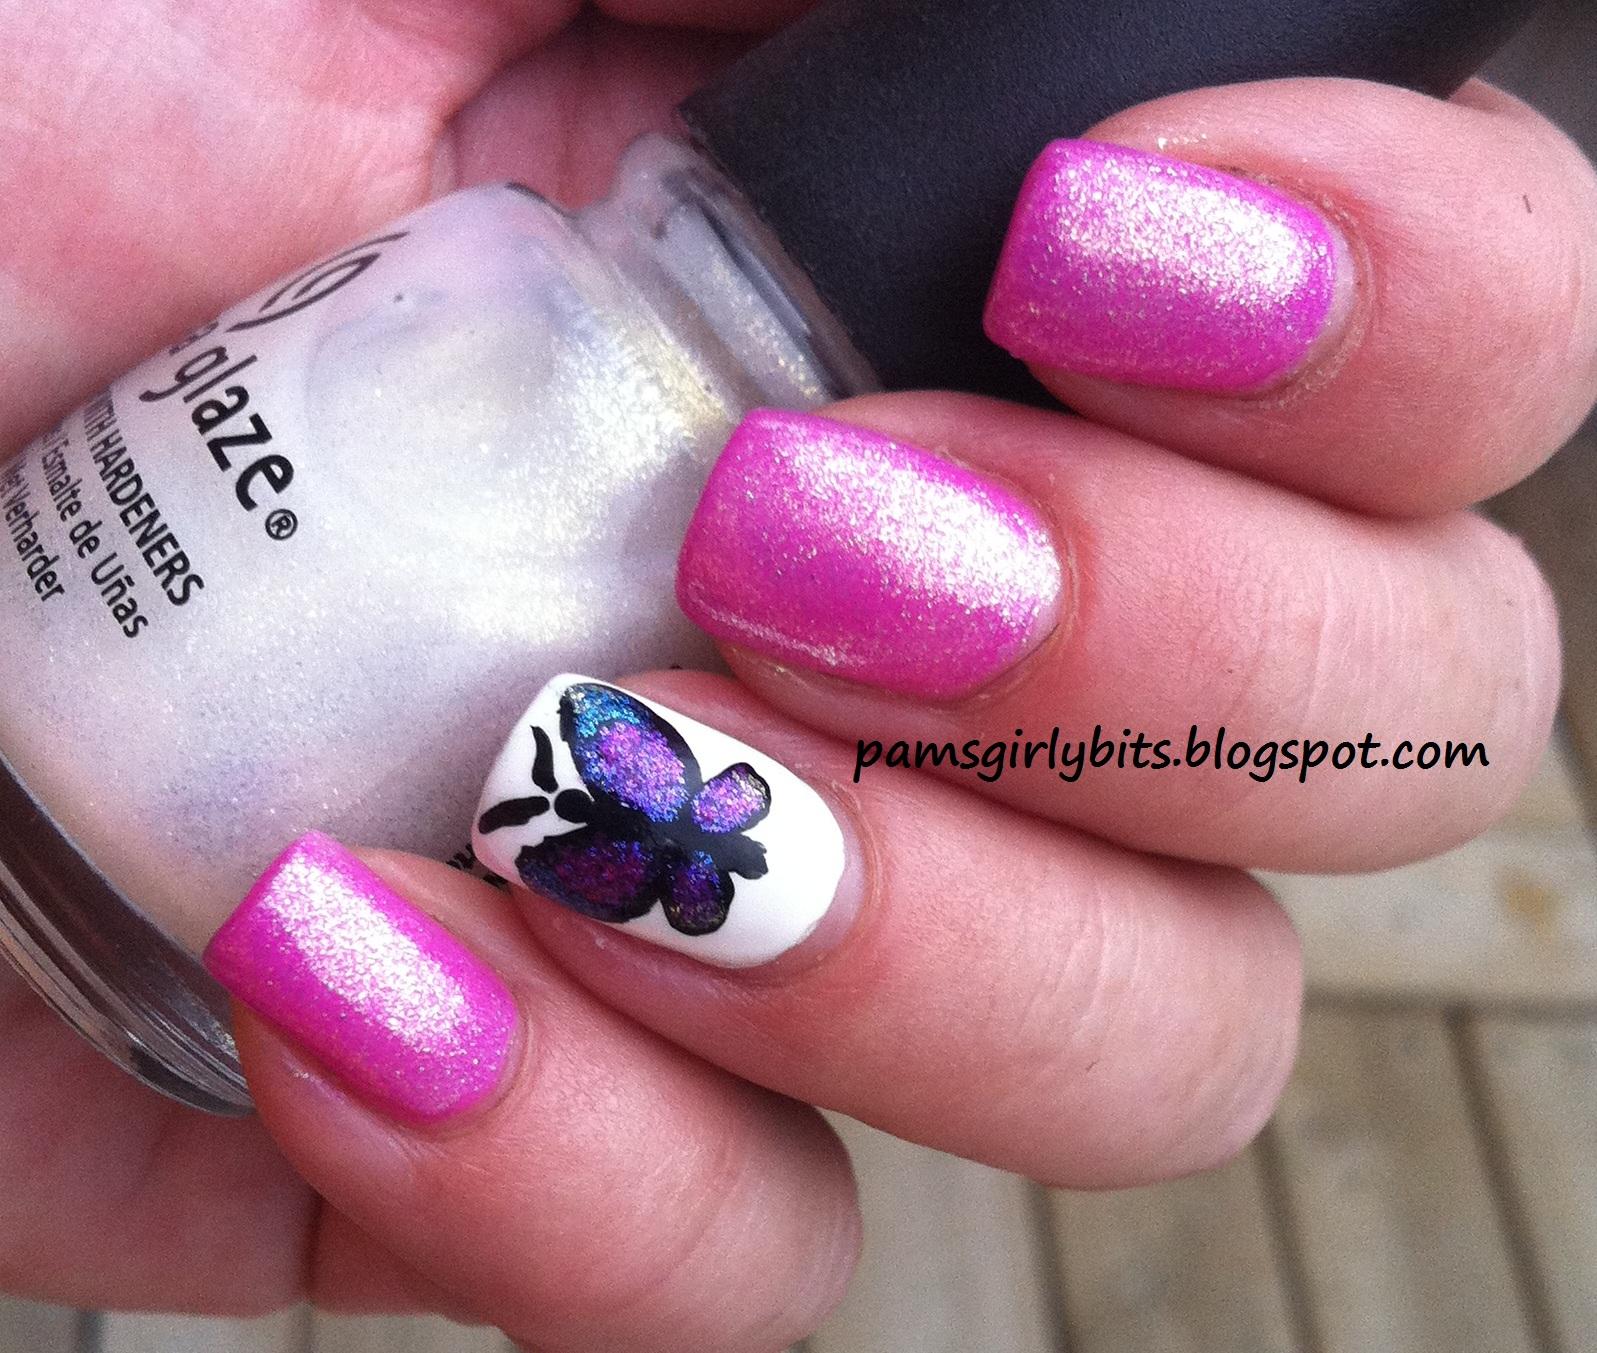 Girly Nail Art: Girly Bits: Butterfly Nail Art